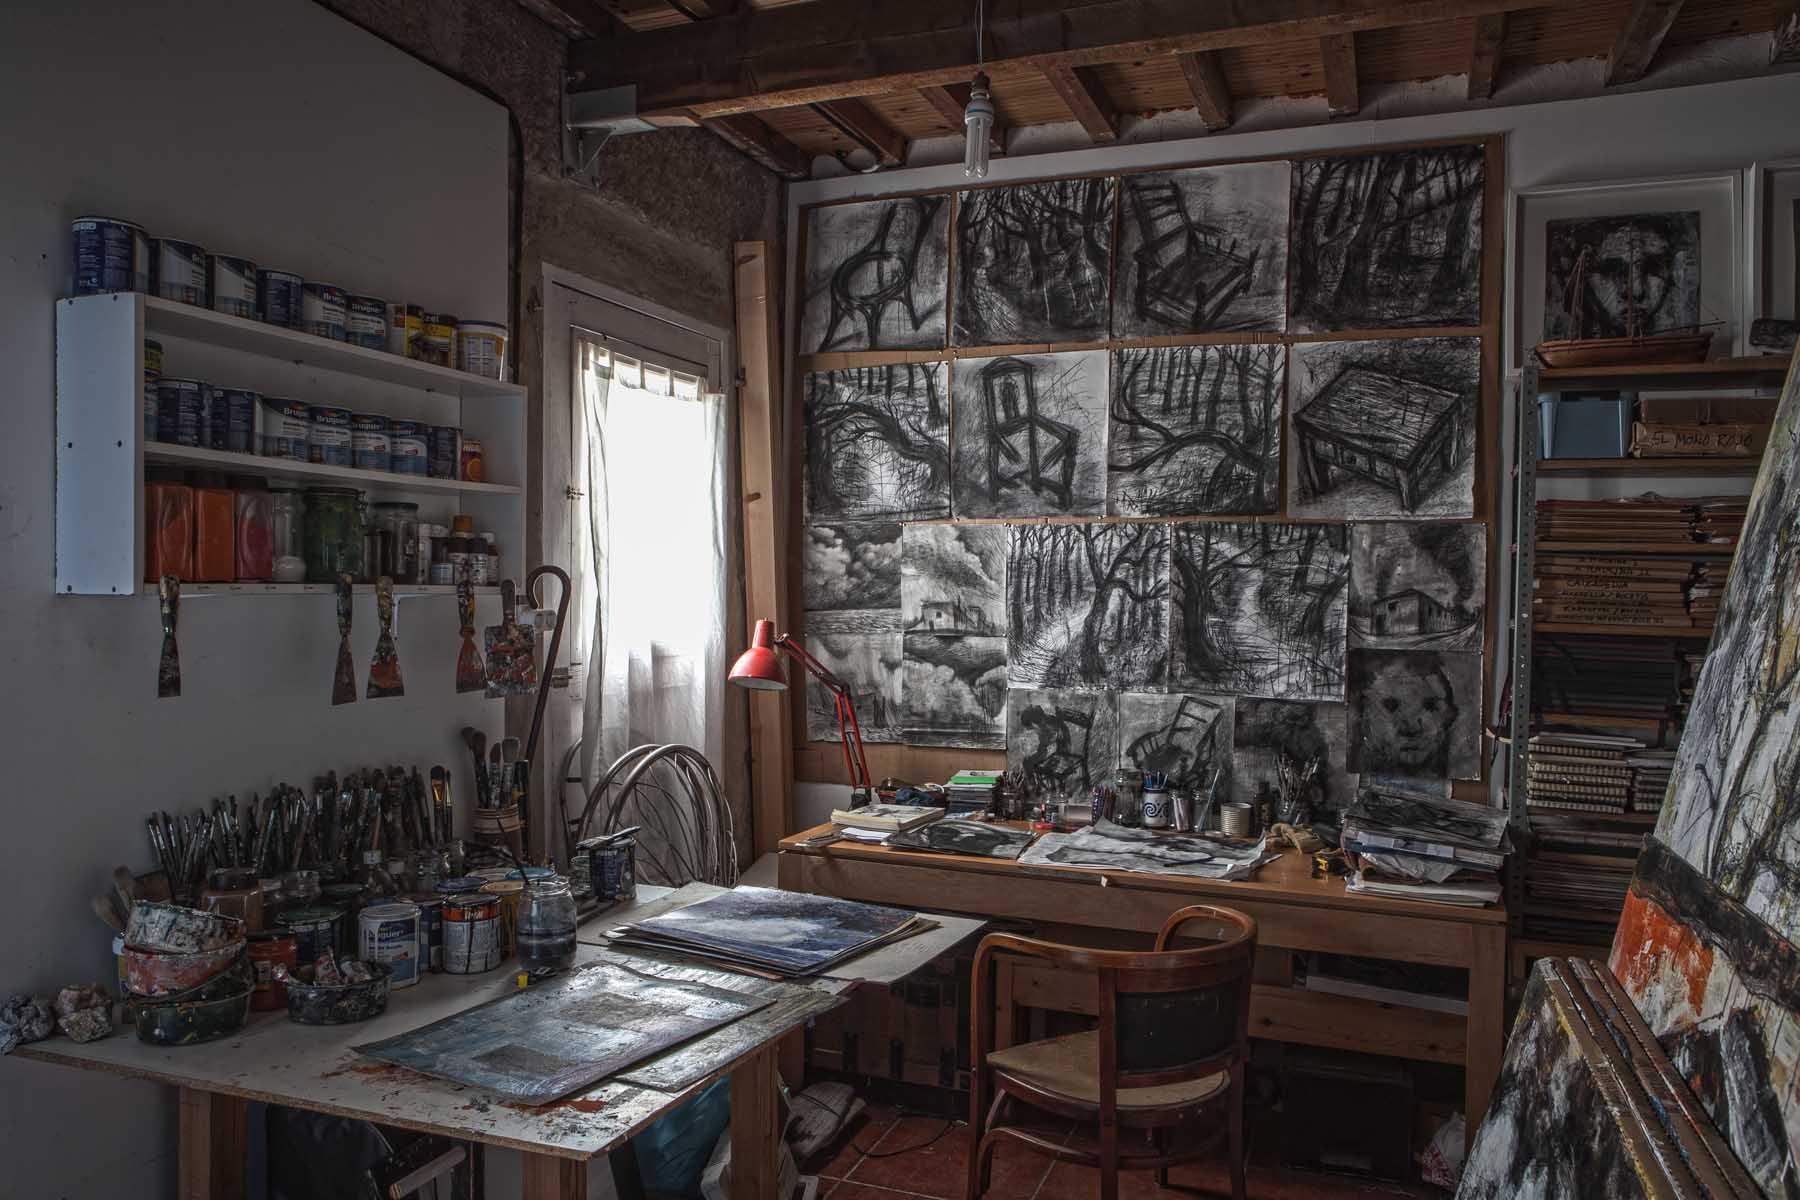 eduardo armada - fotografía y diseño web - ramón trigo casa da parra